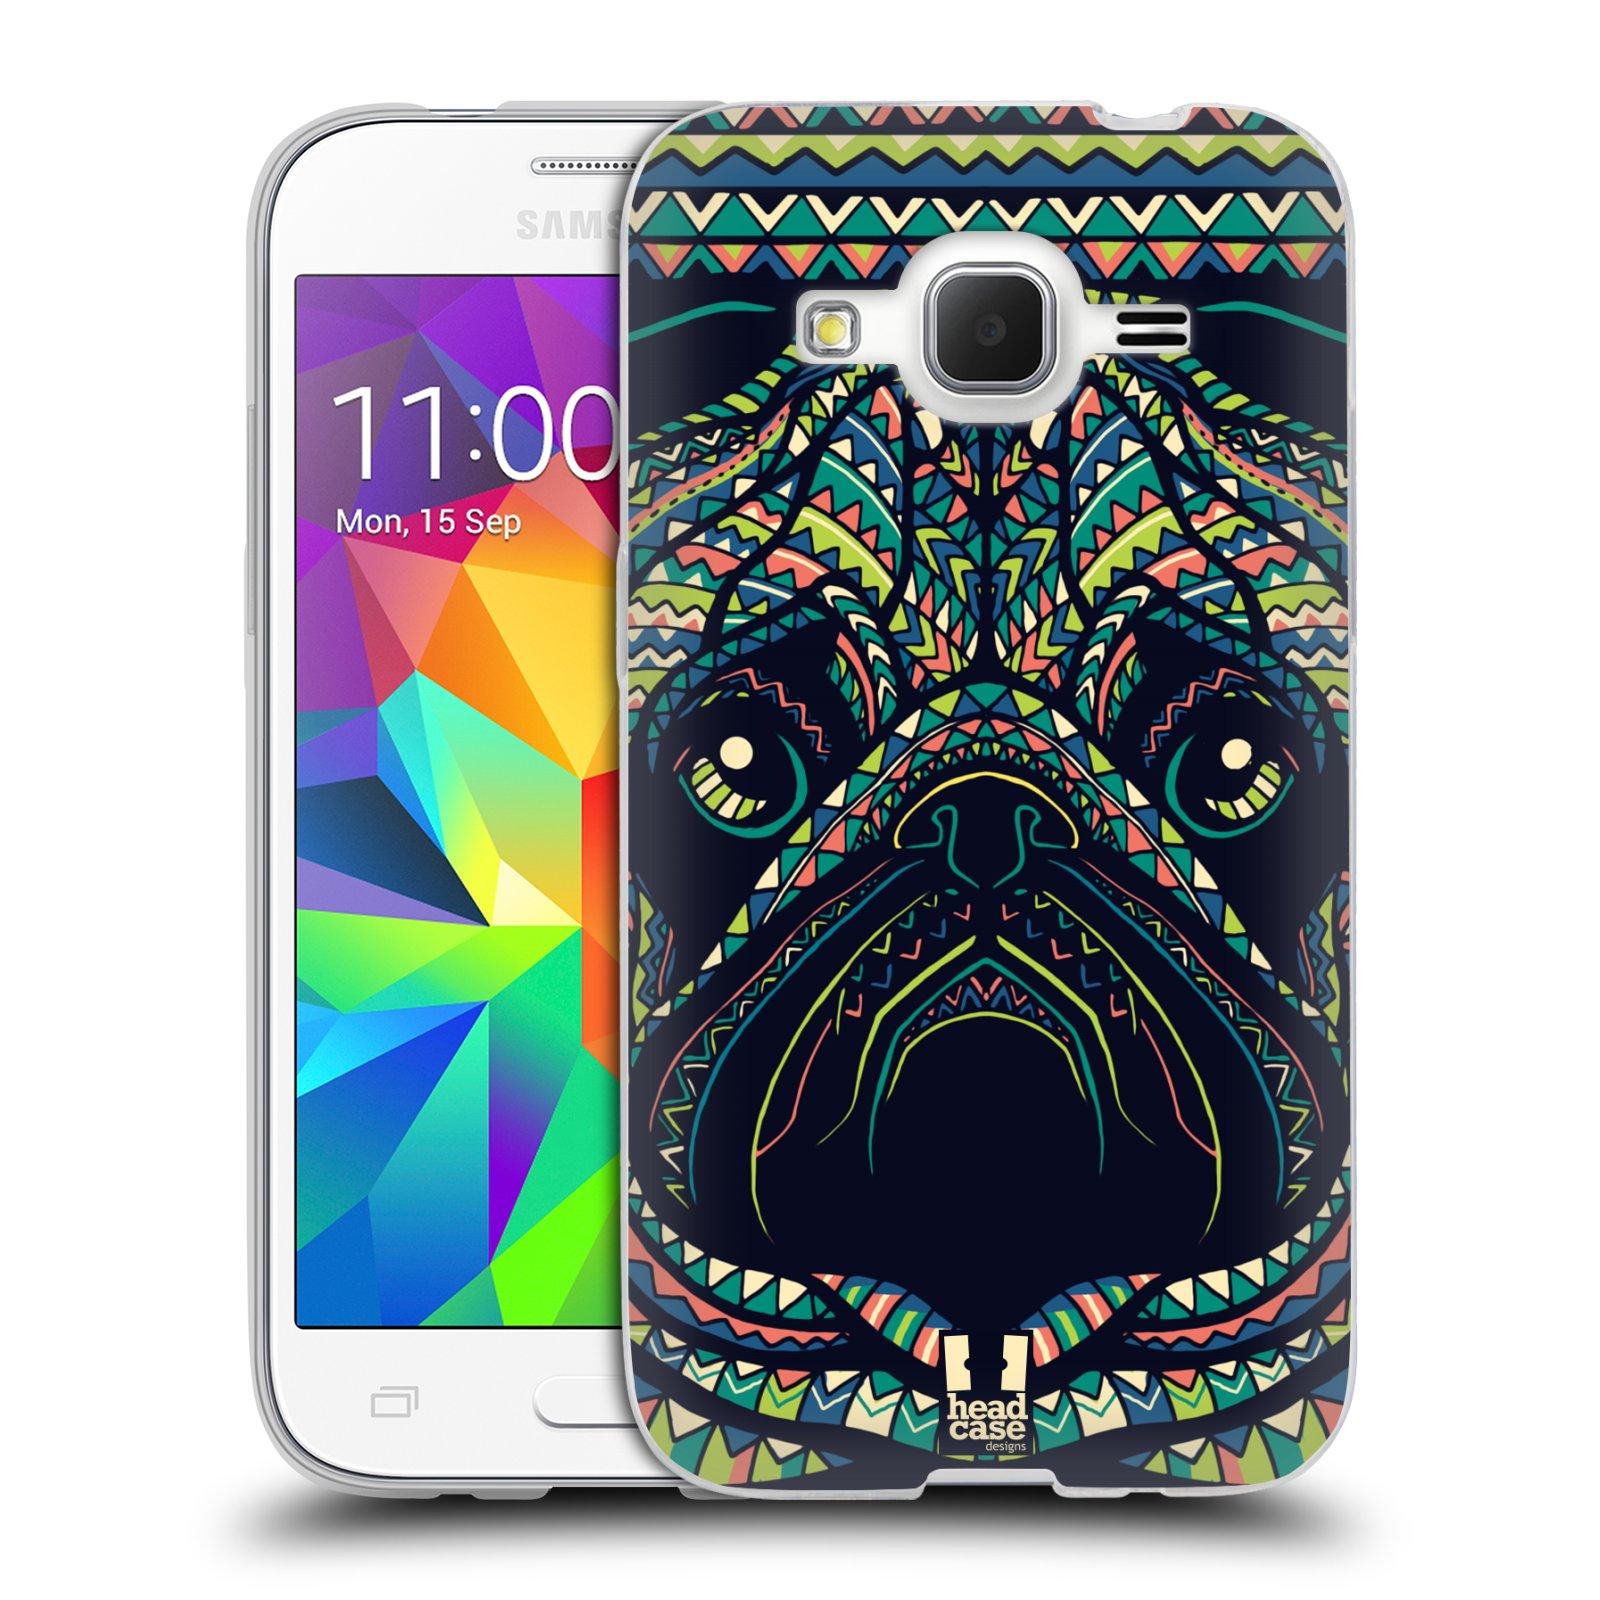 Silikonové pouzdro na mobil Samsung Galaxy Core Prime VE HEAD CASE AZTEC MOPS